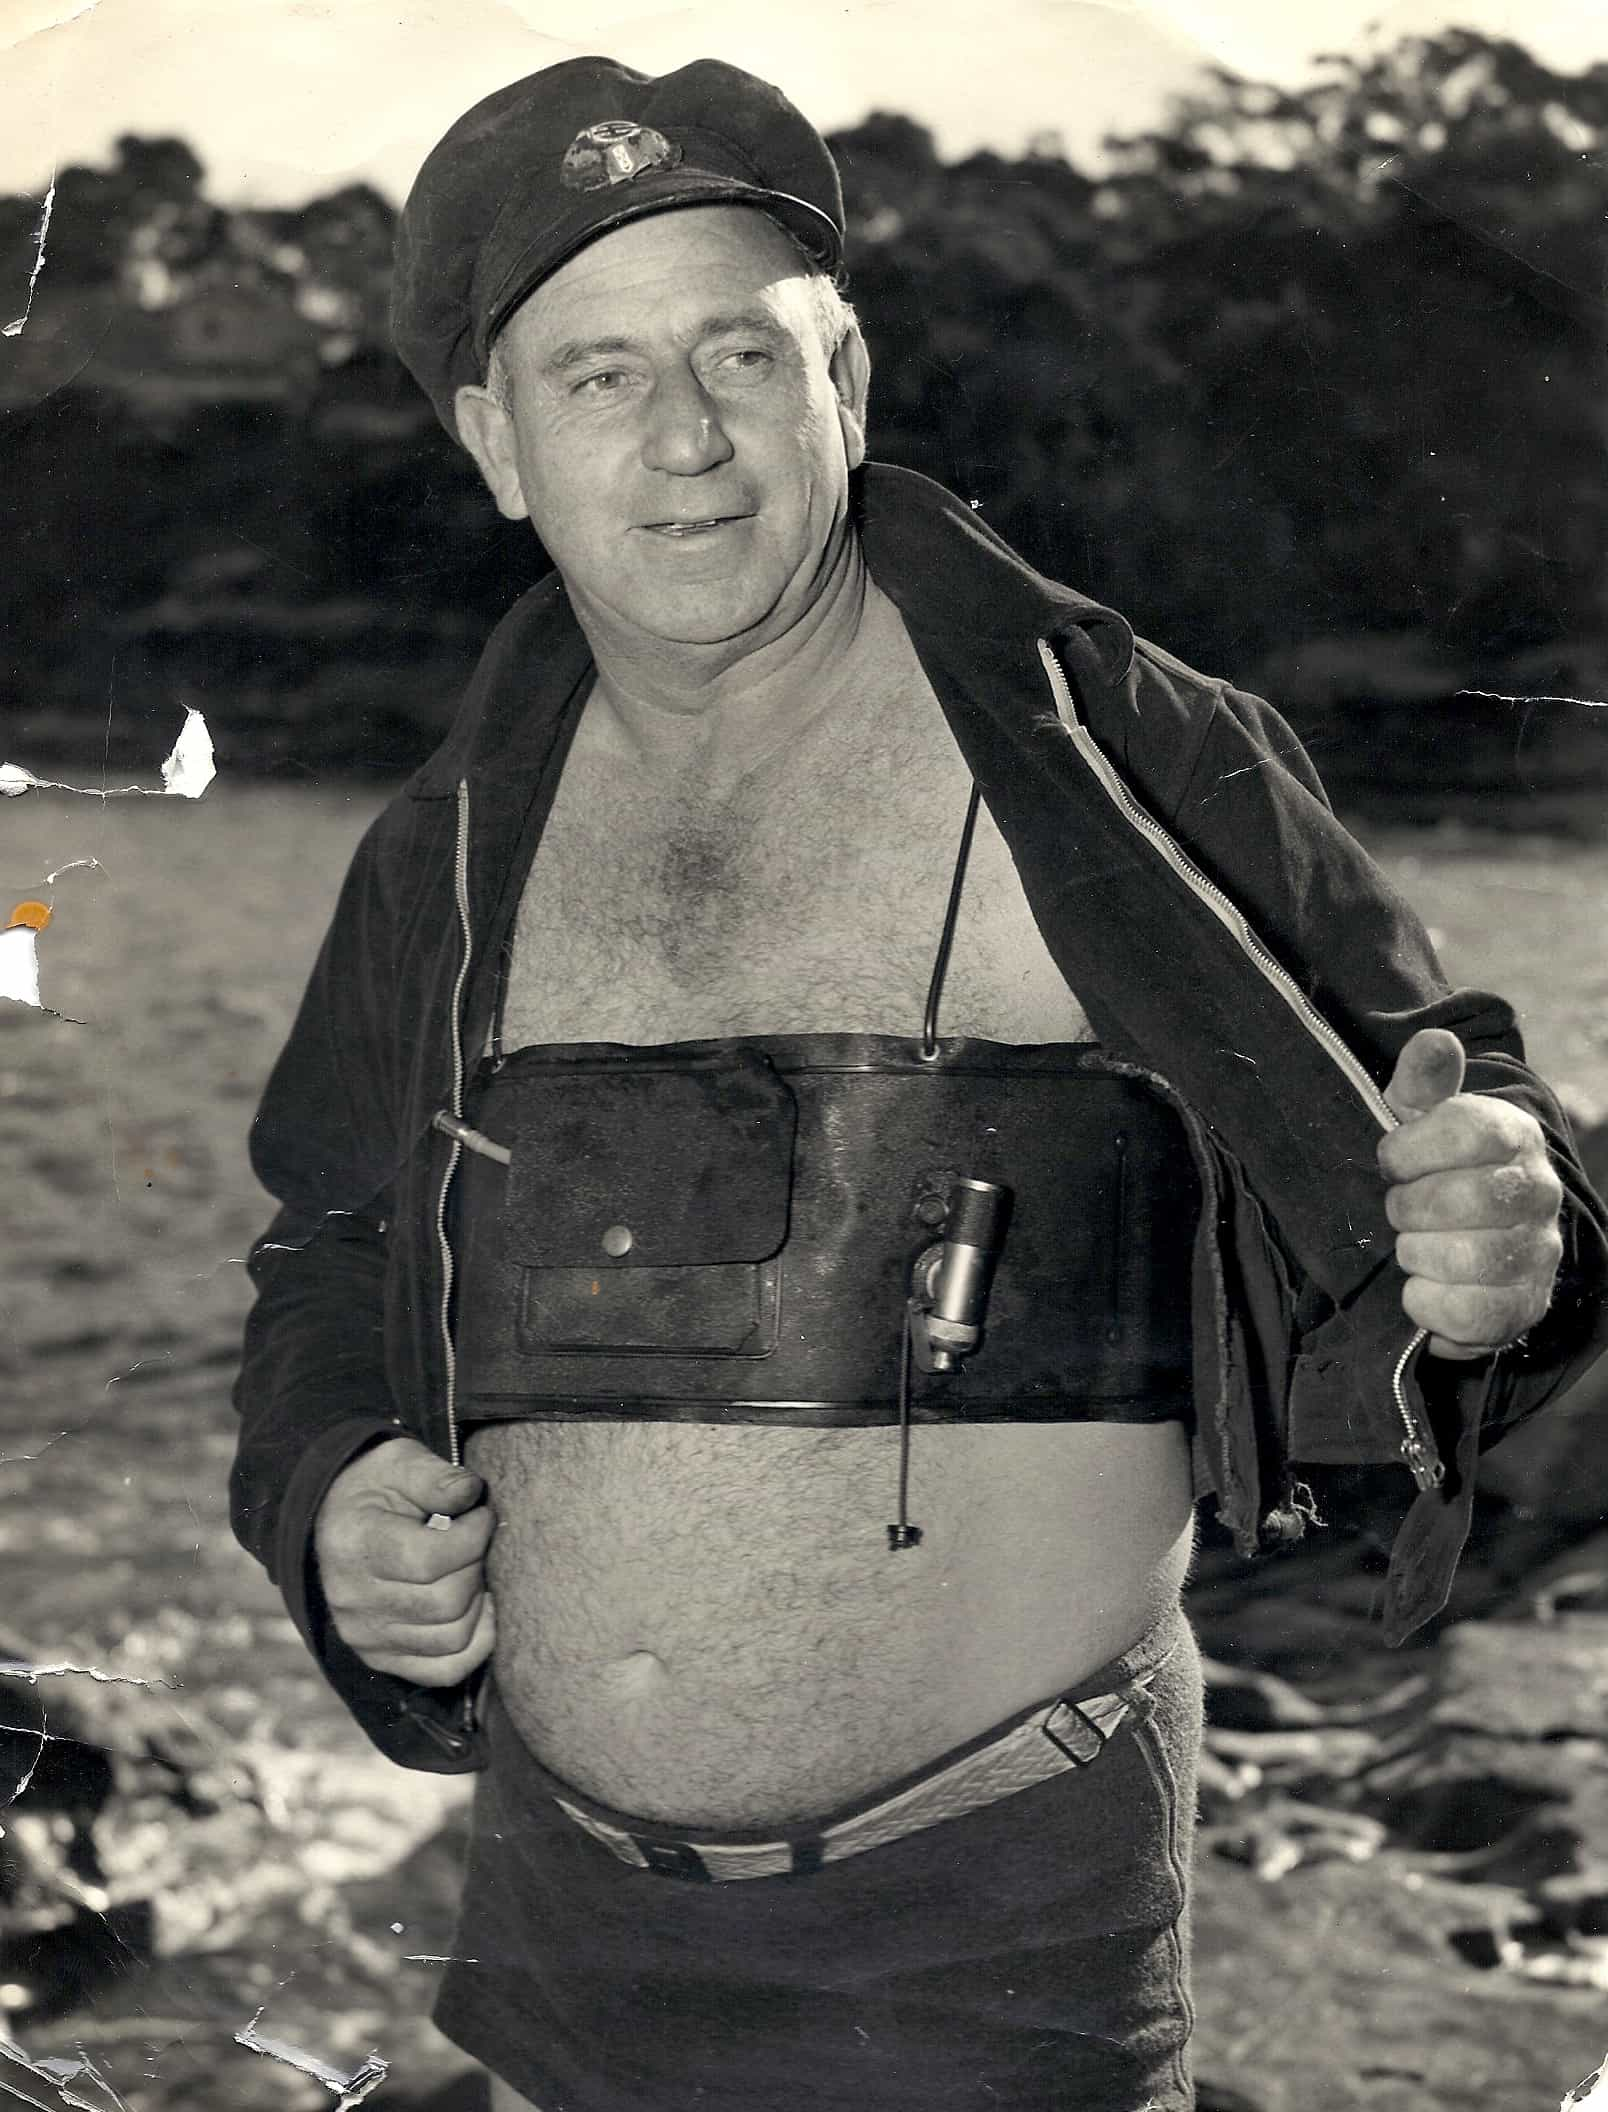 St Charles Boat And Motor >> Historical Diving Society | Richard (Dick) Charles